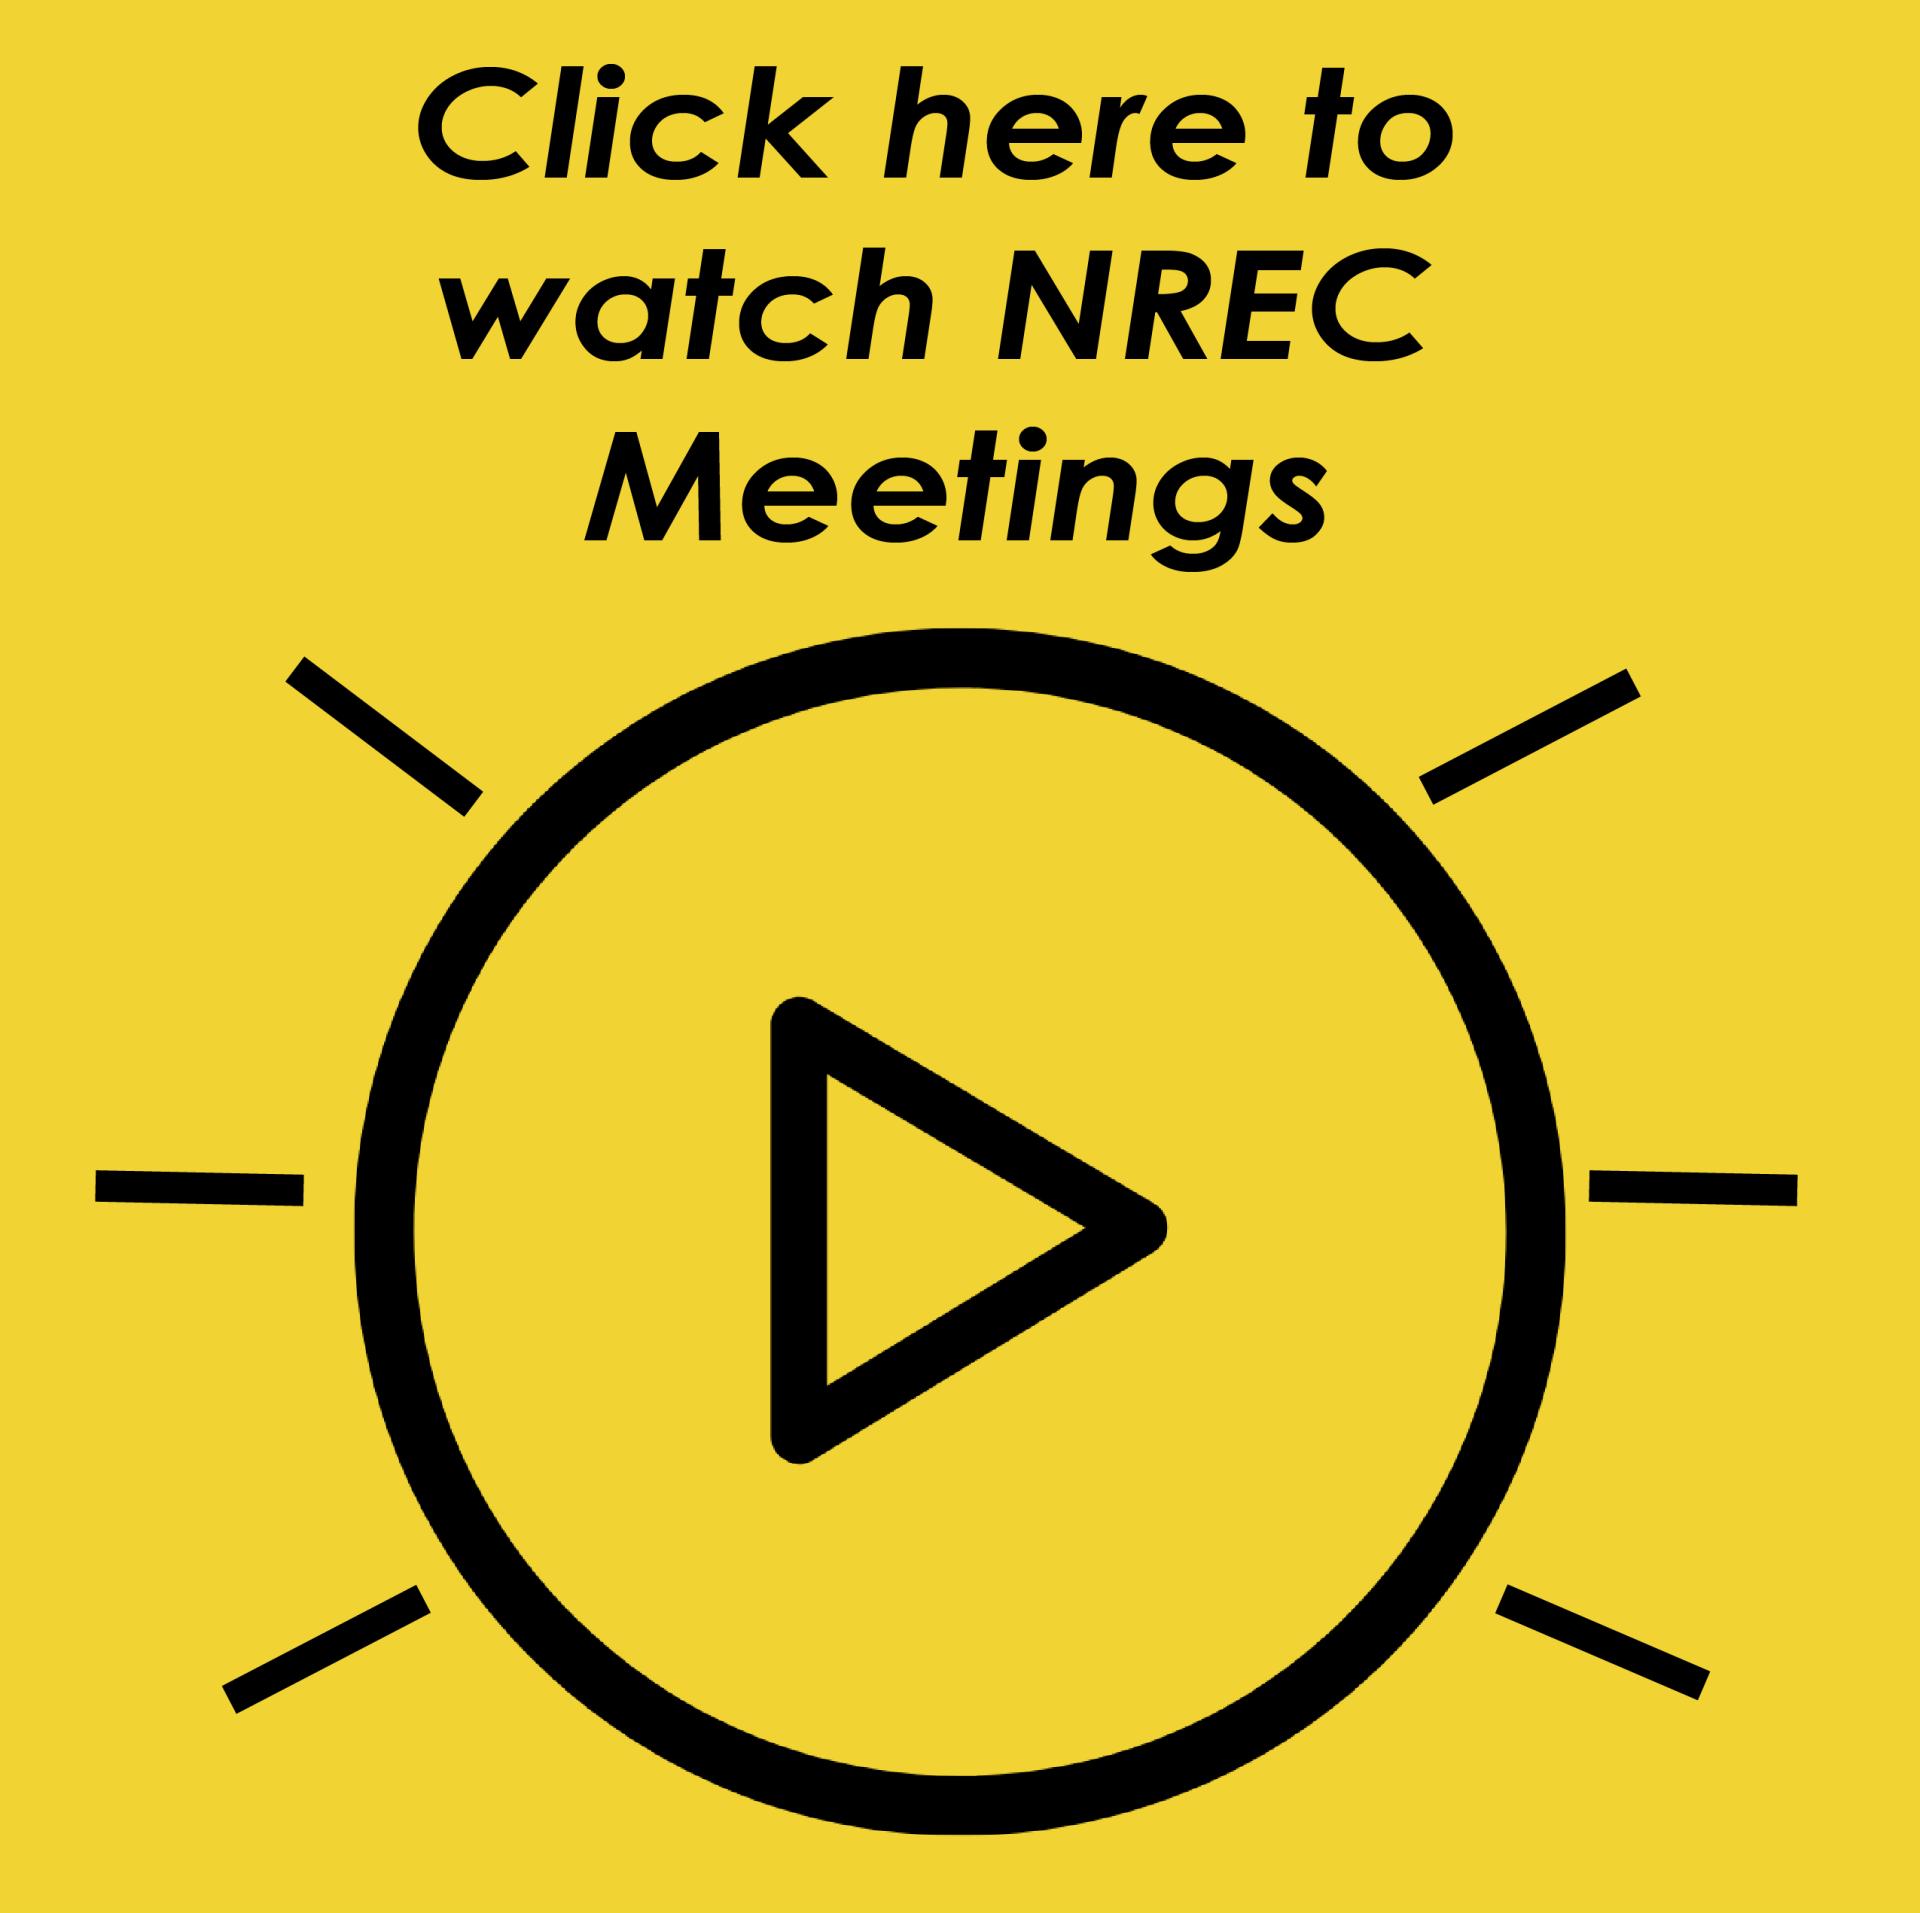 NREC Meetings Logo